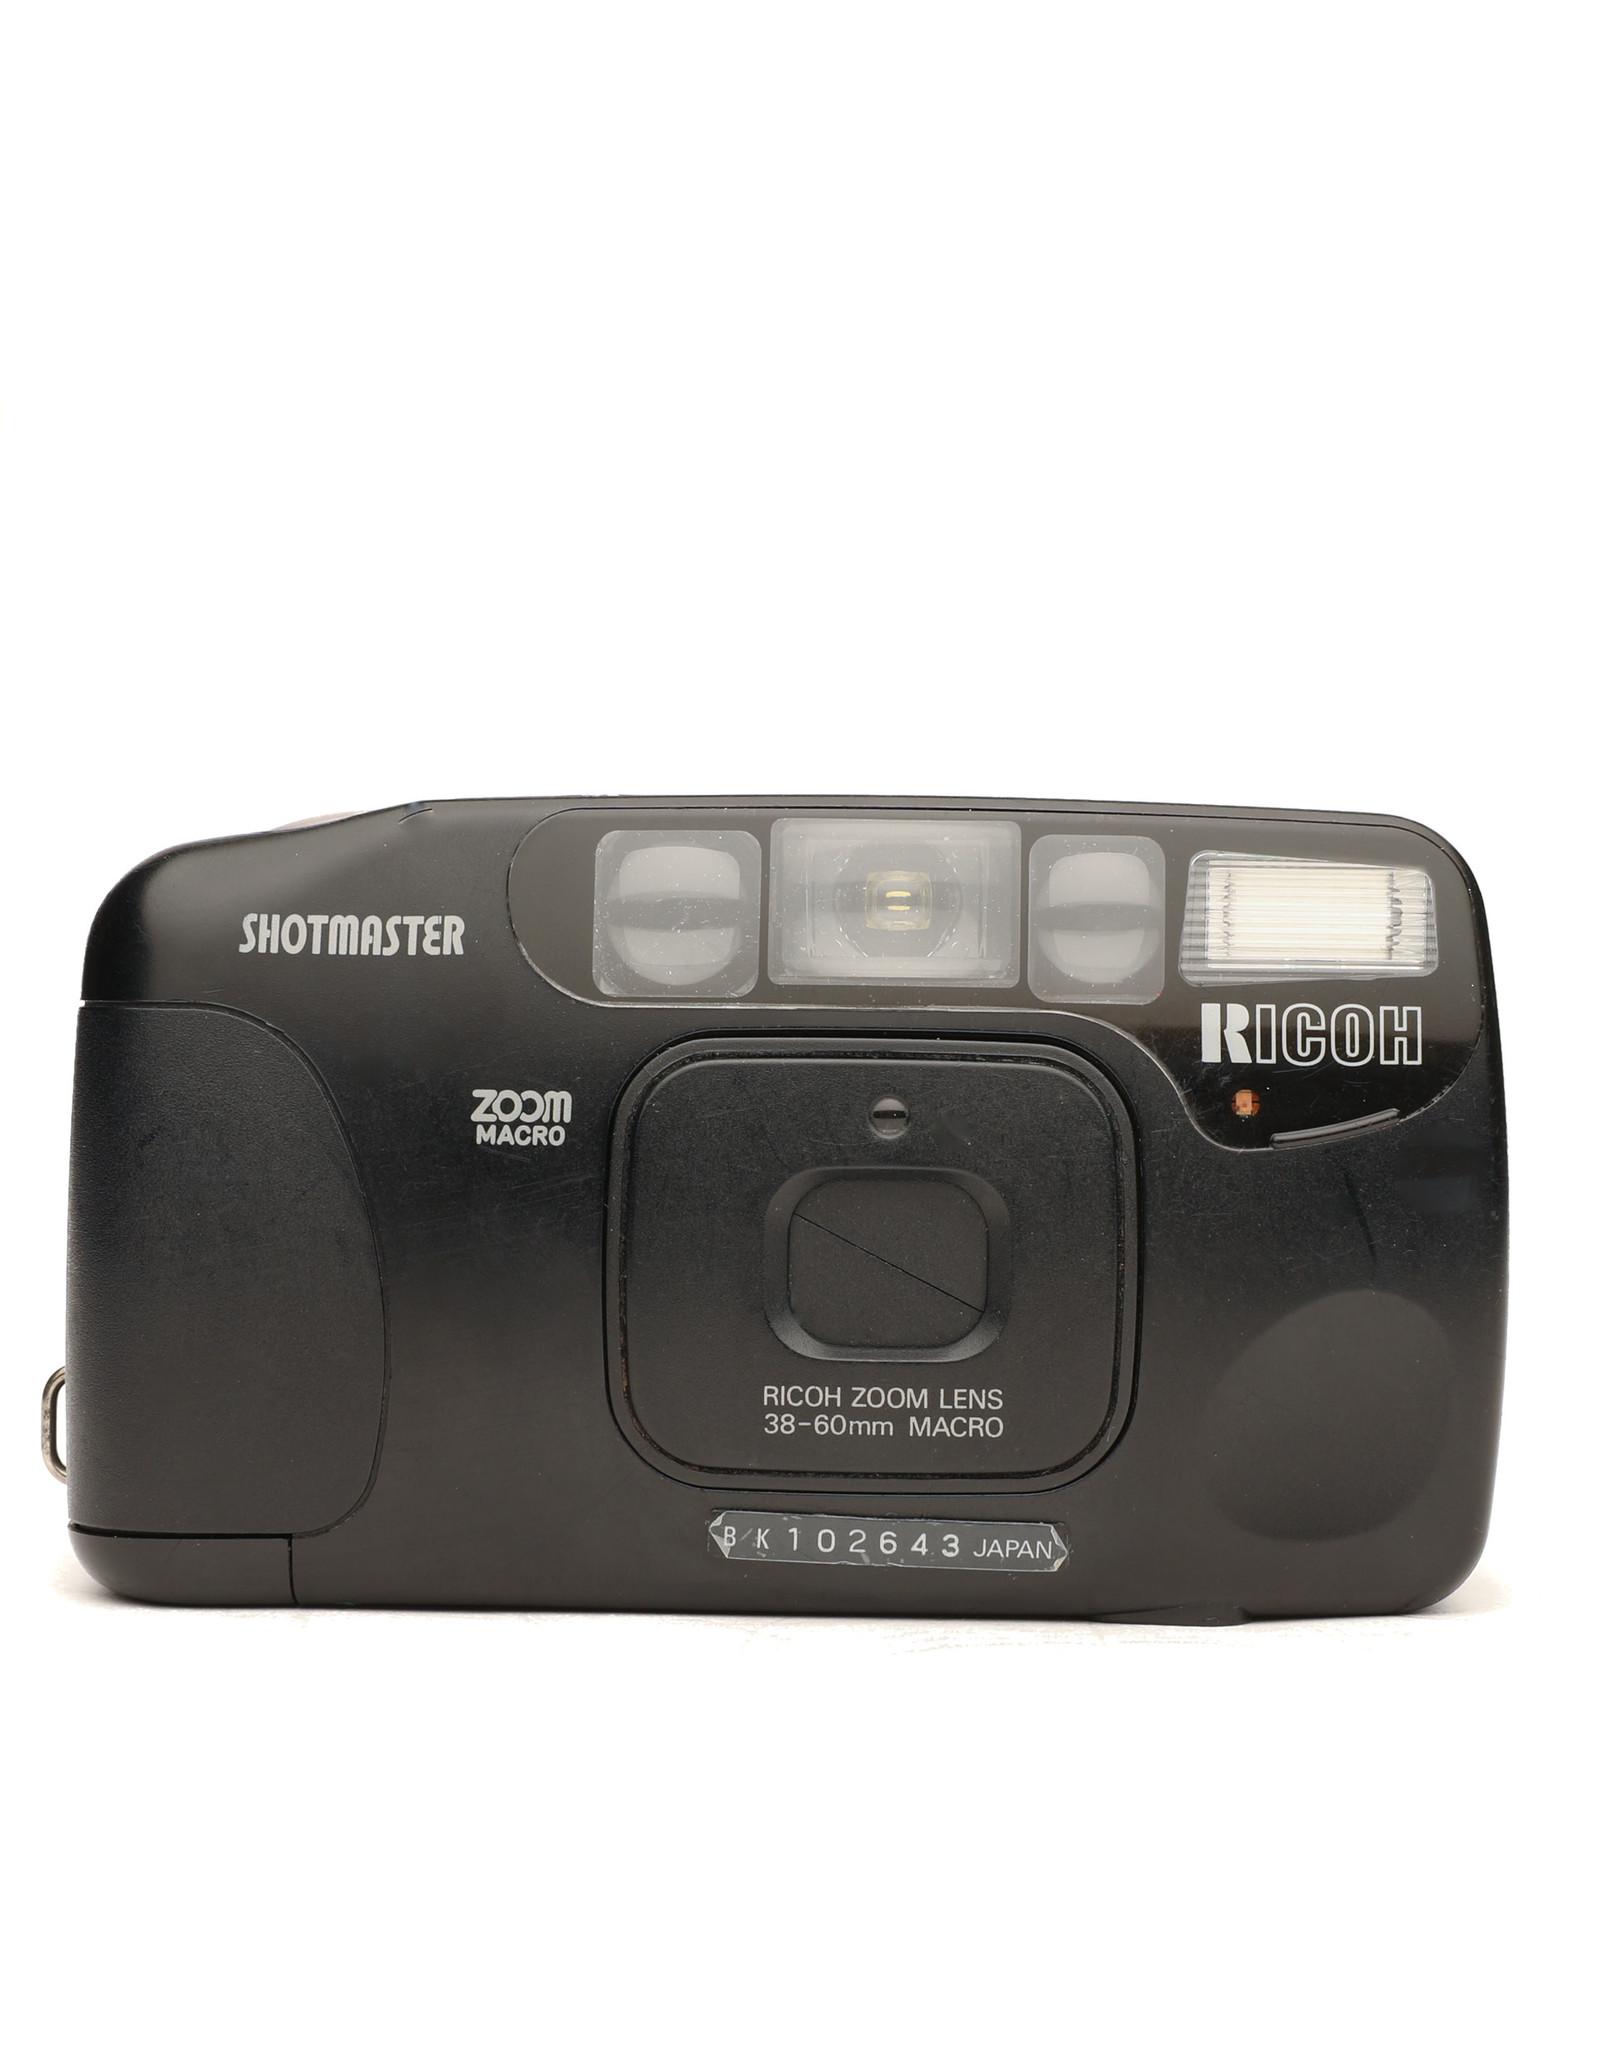 Ricoh RICOH SHOTMASTER ZOOM 35mm Point and Shoot Camera